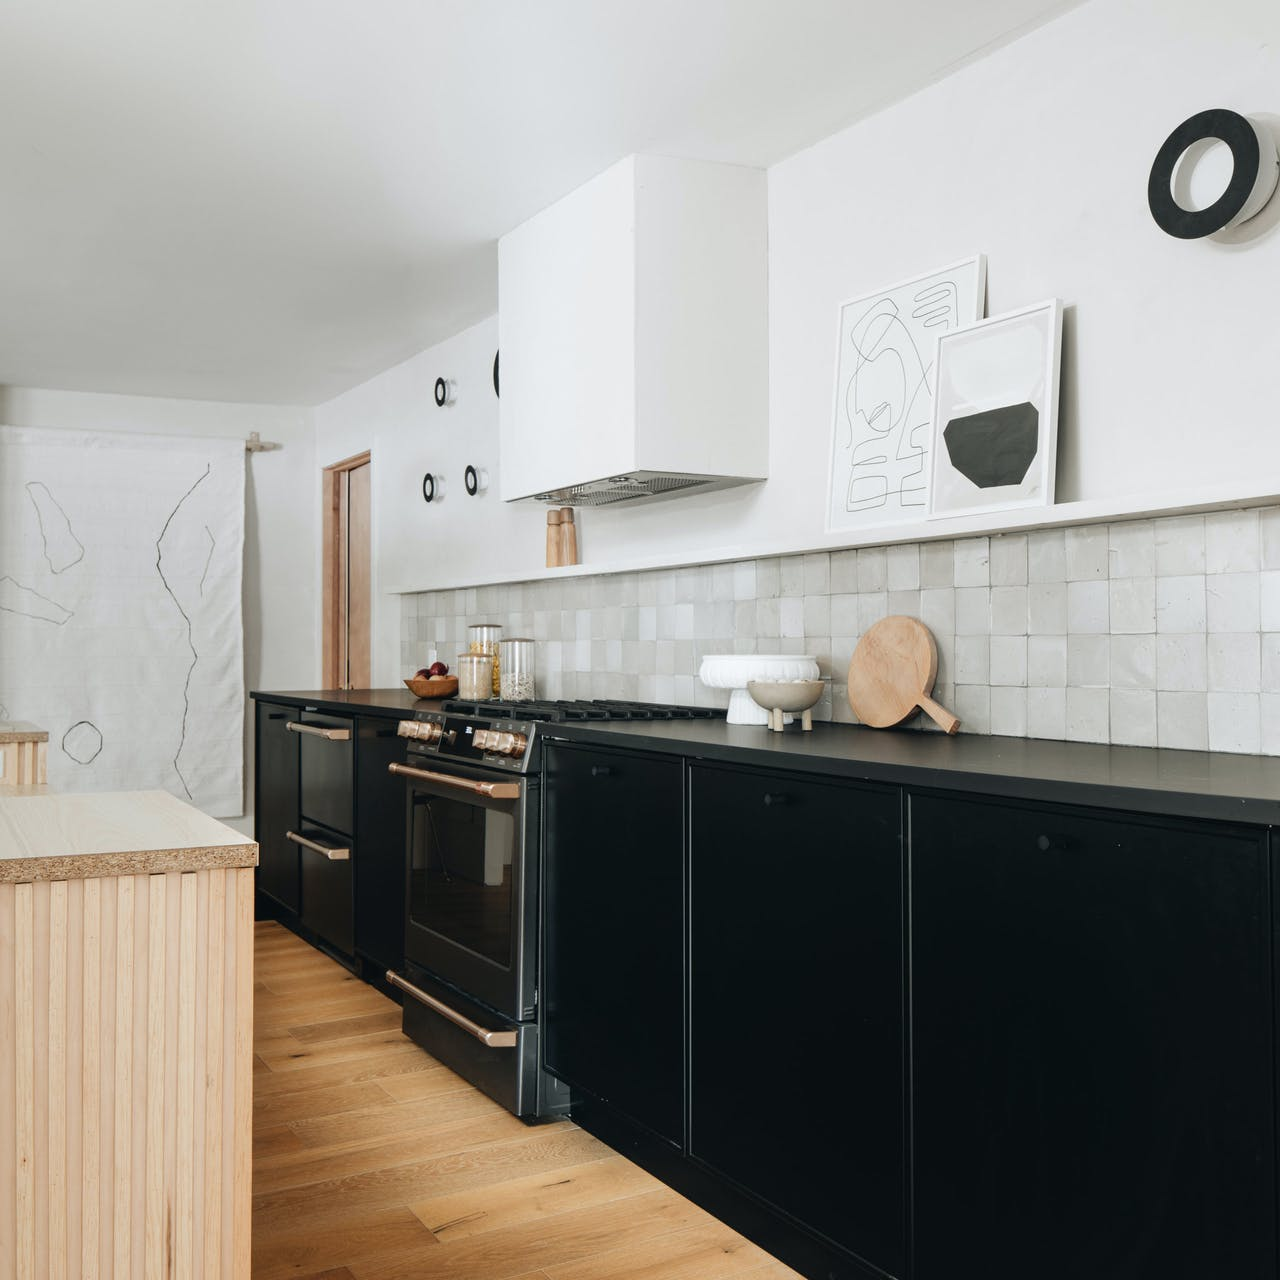 matte black range in semihandmade cabinets